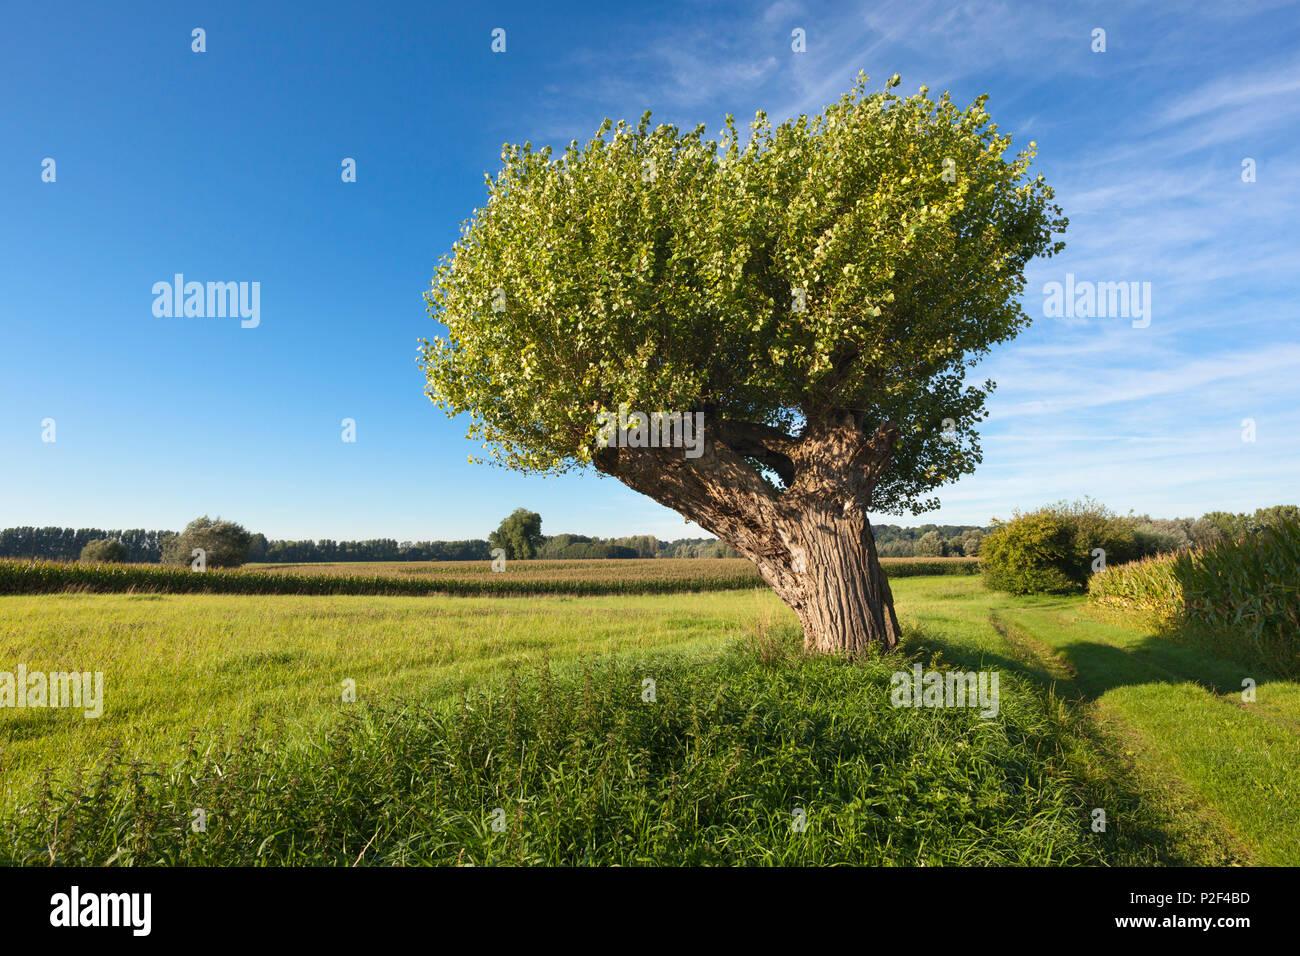 Pollard willow at Bislicher Insel, near Xanten, Lower Rhine, North-Rhine Westphalia, Germany Stock Photo